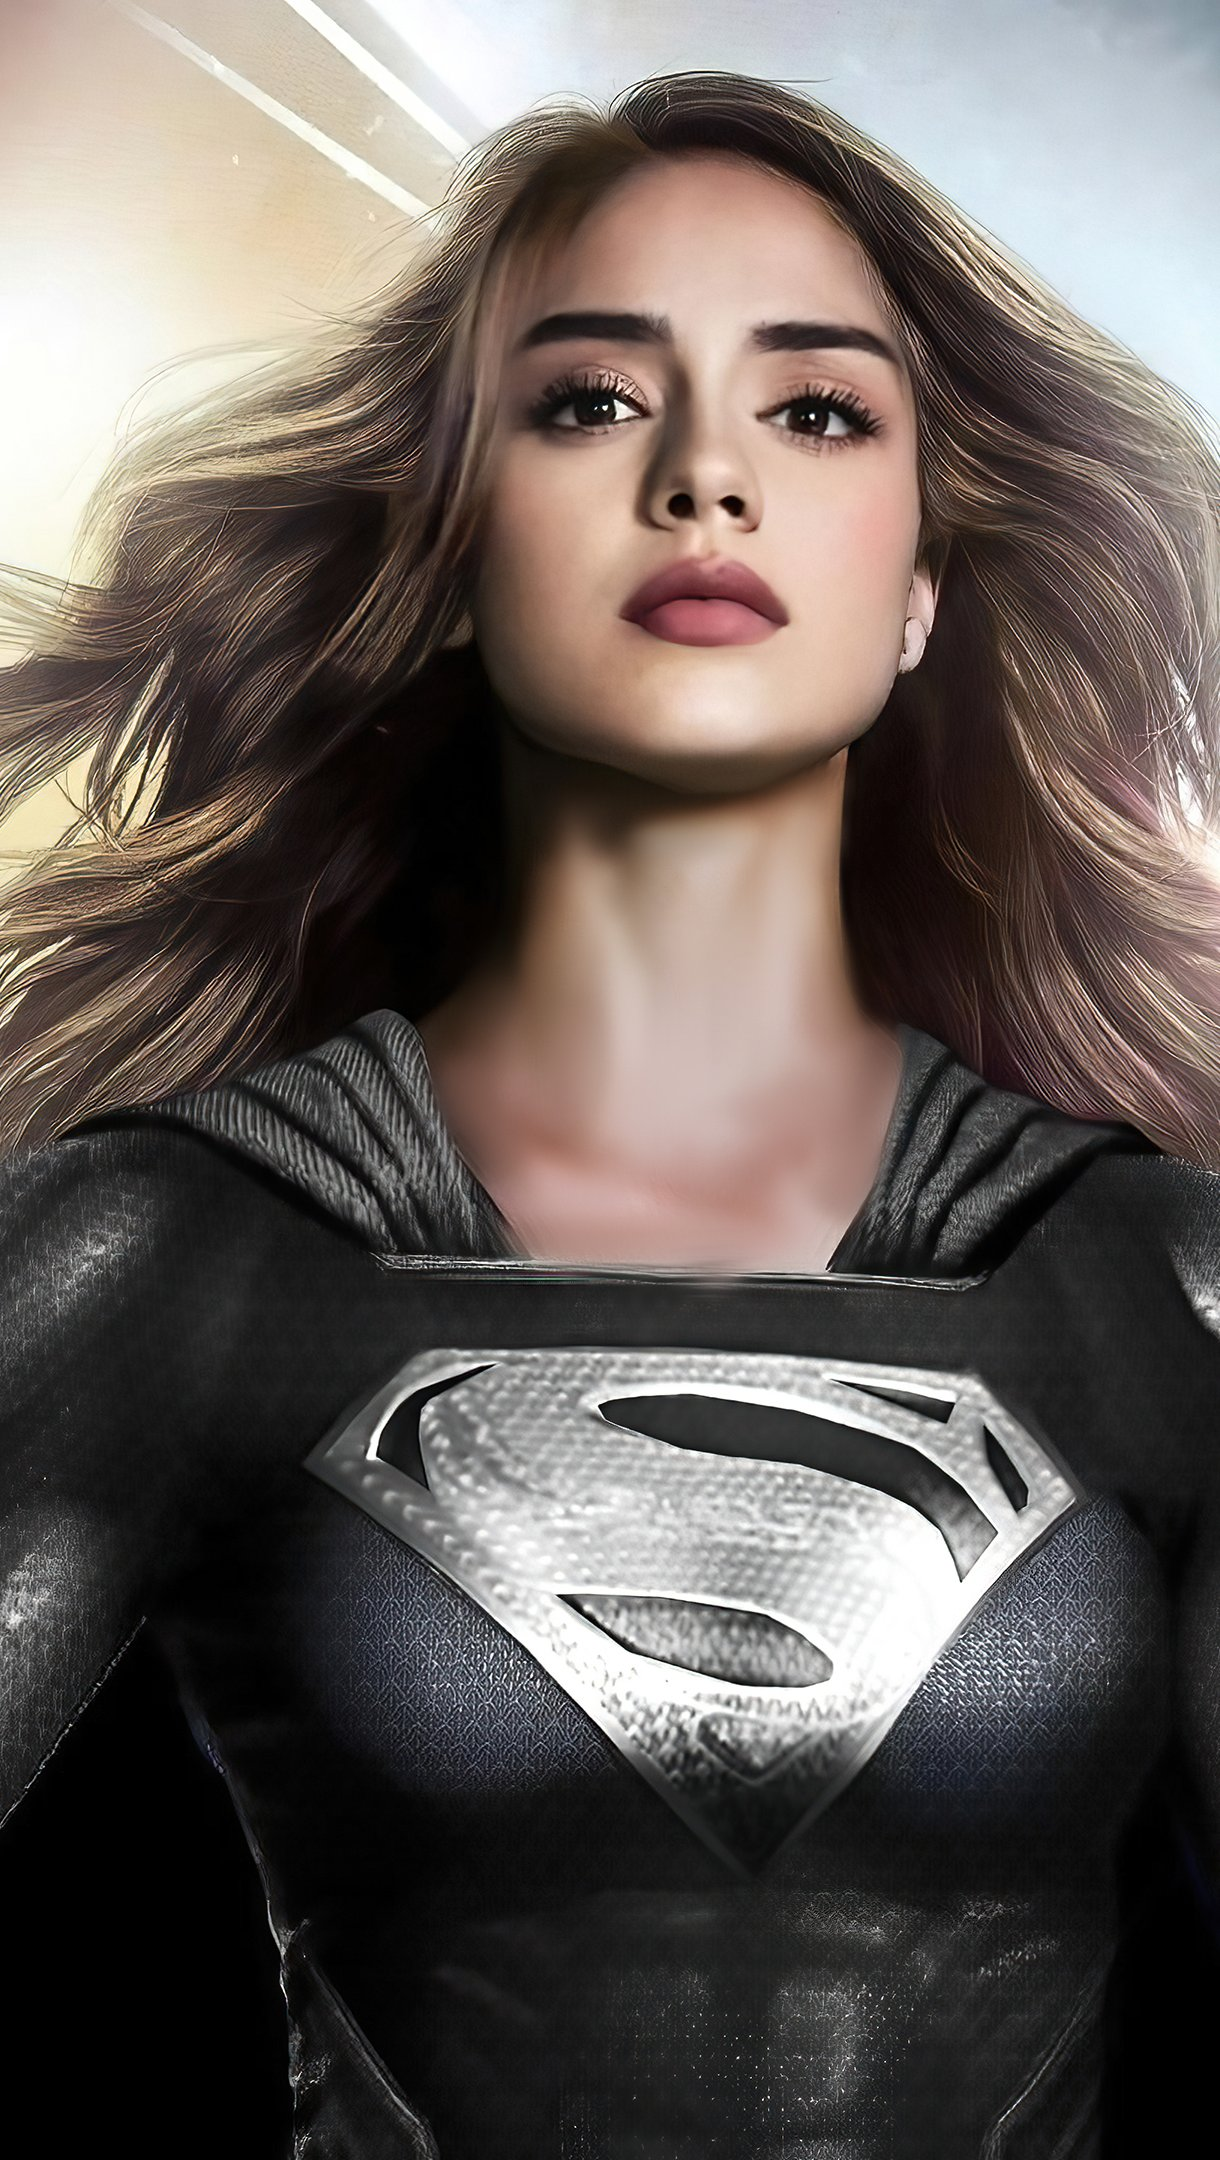 Wallpaper Sasha Calle as Supergirl Fanart Vertical